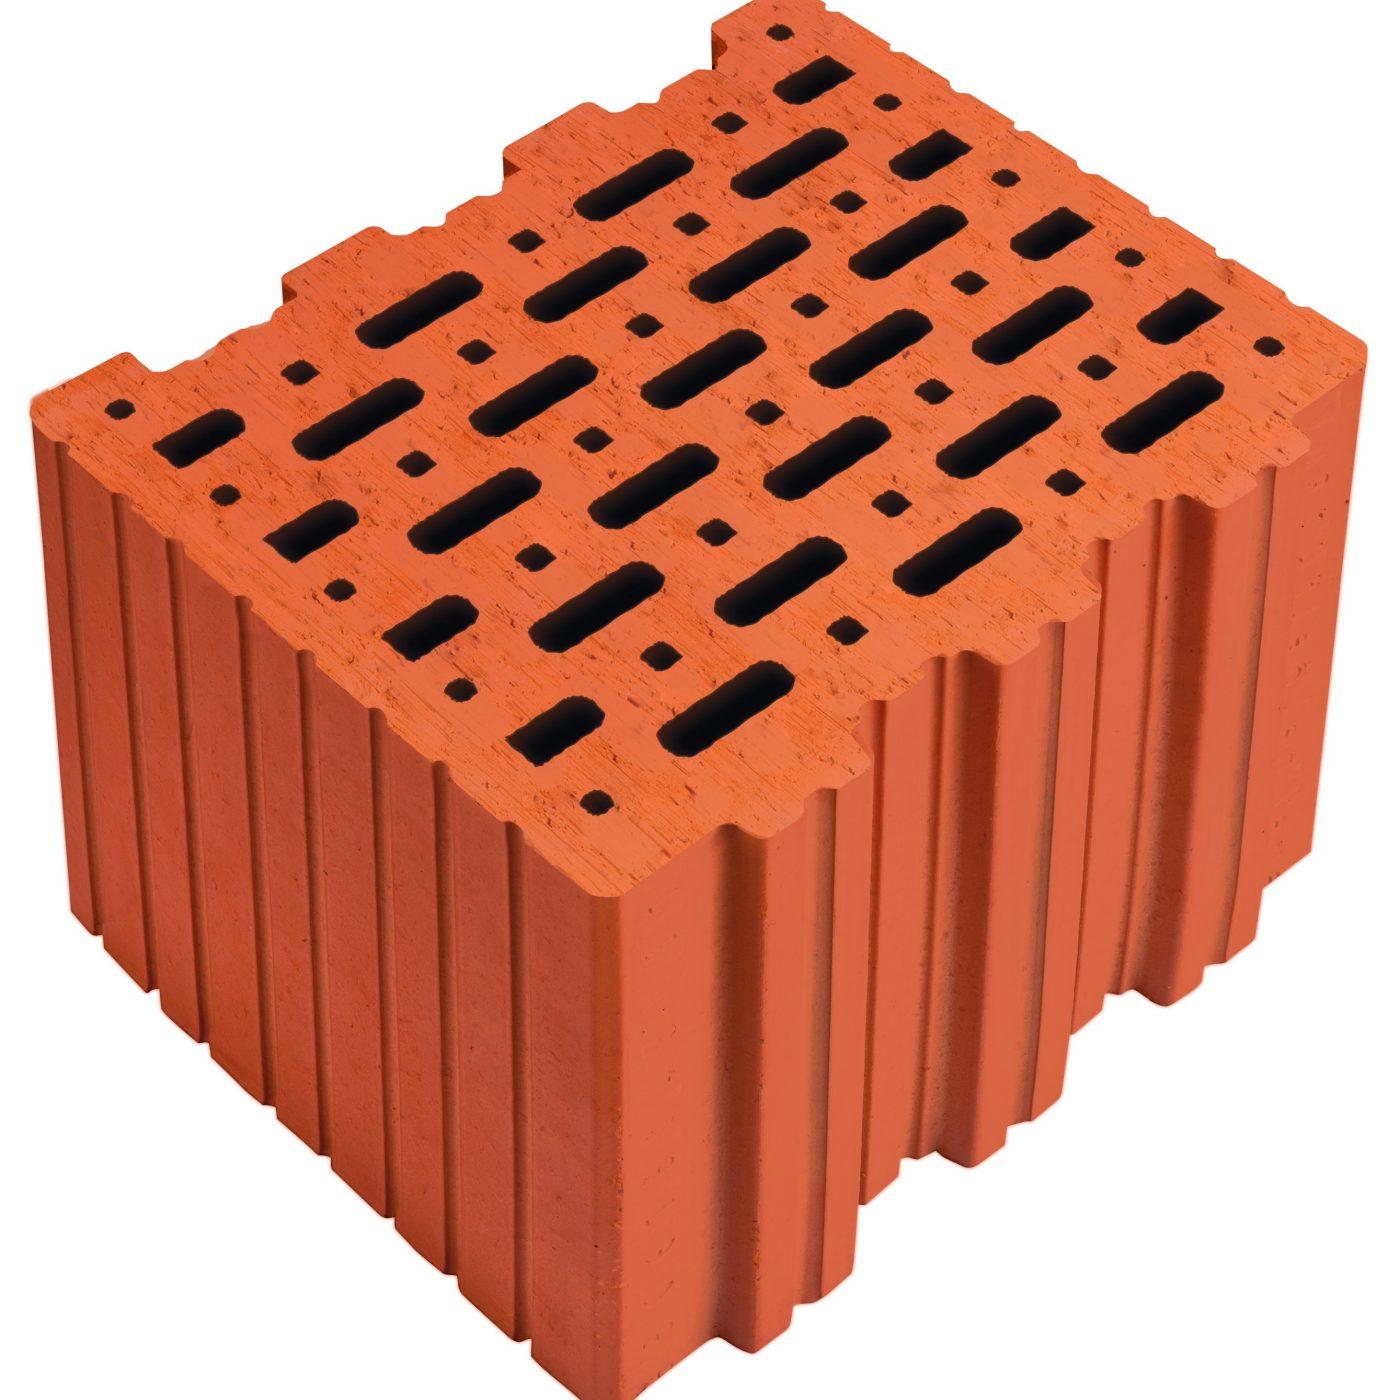 Porotherm 30 AKU Z brick_régi